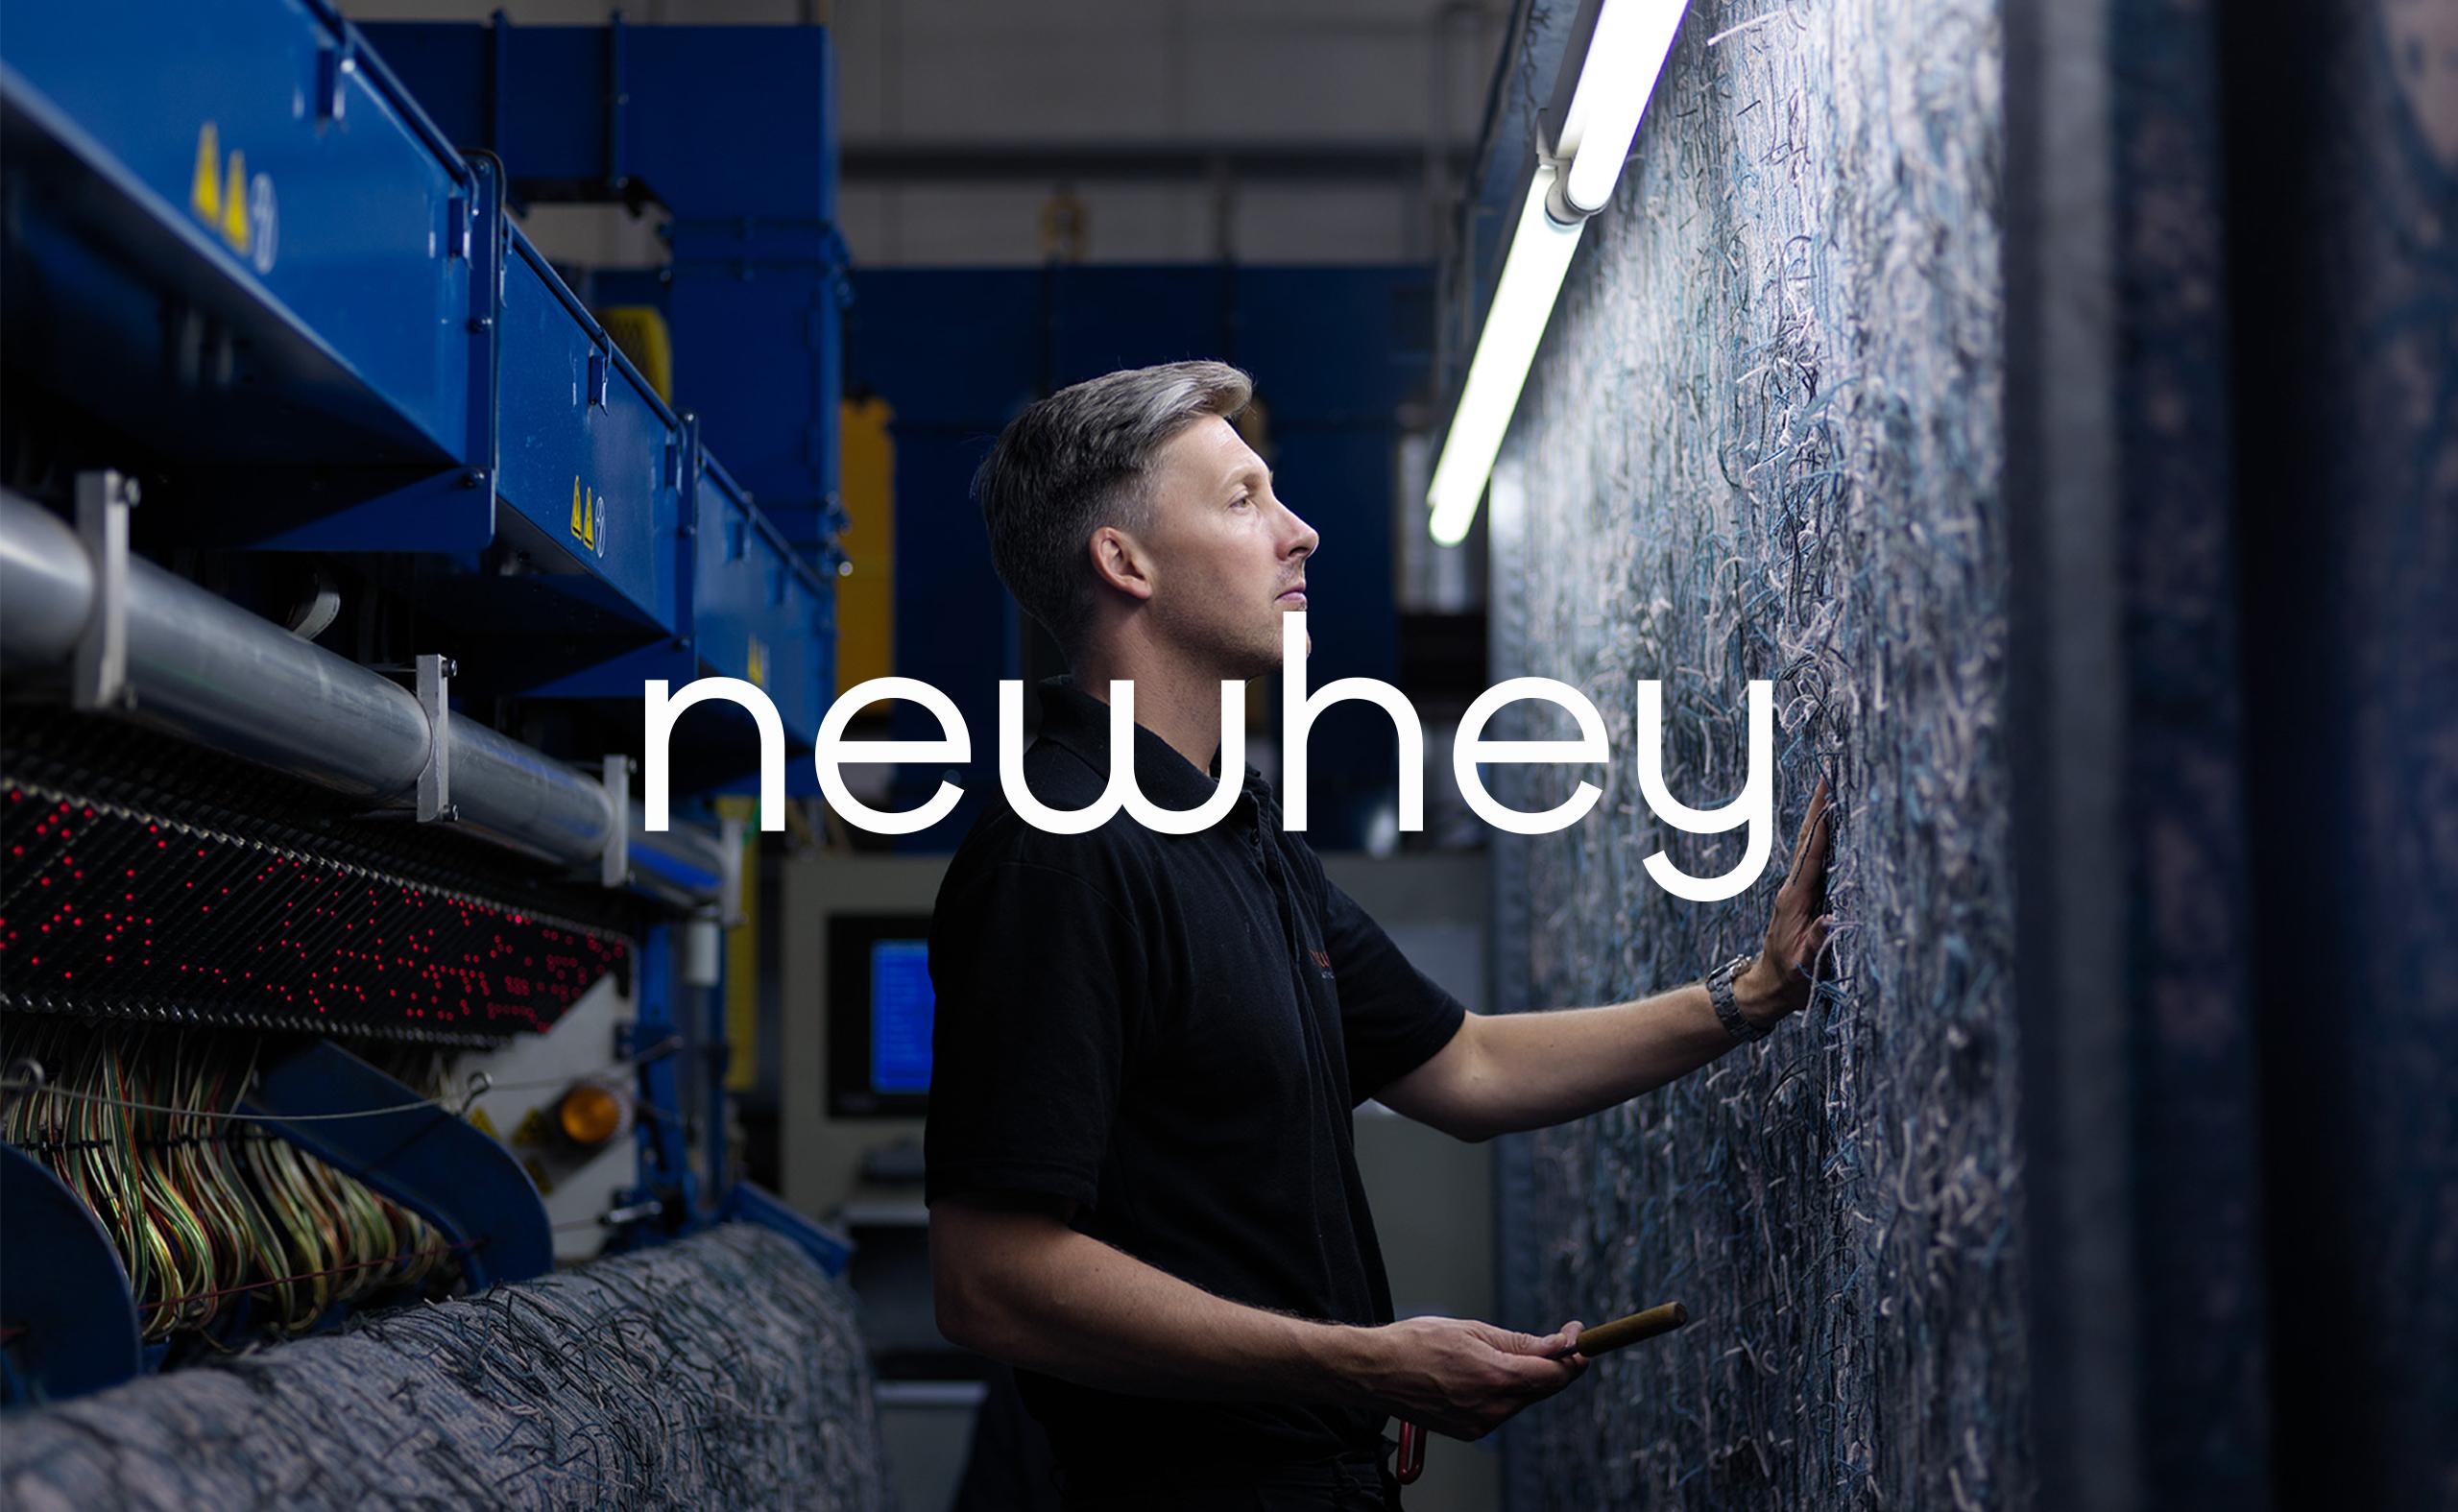 Creating a carpet brand